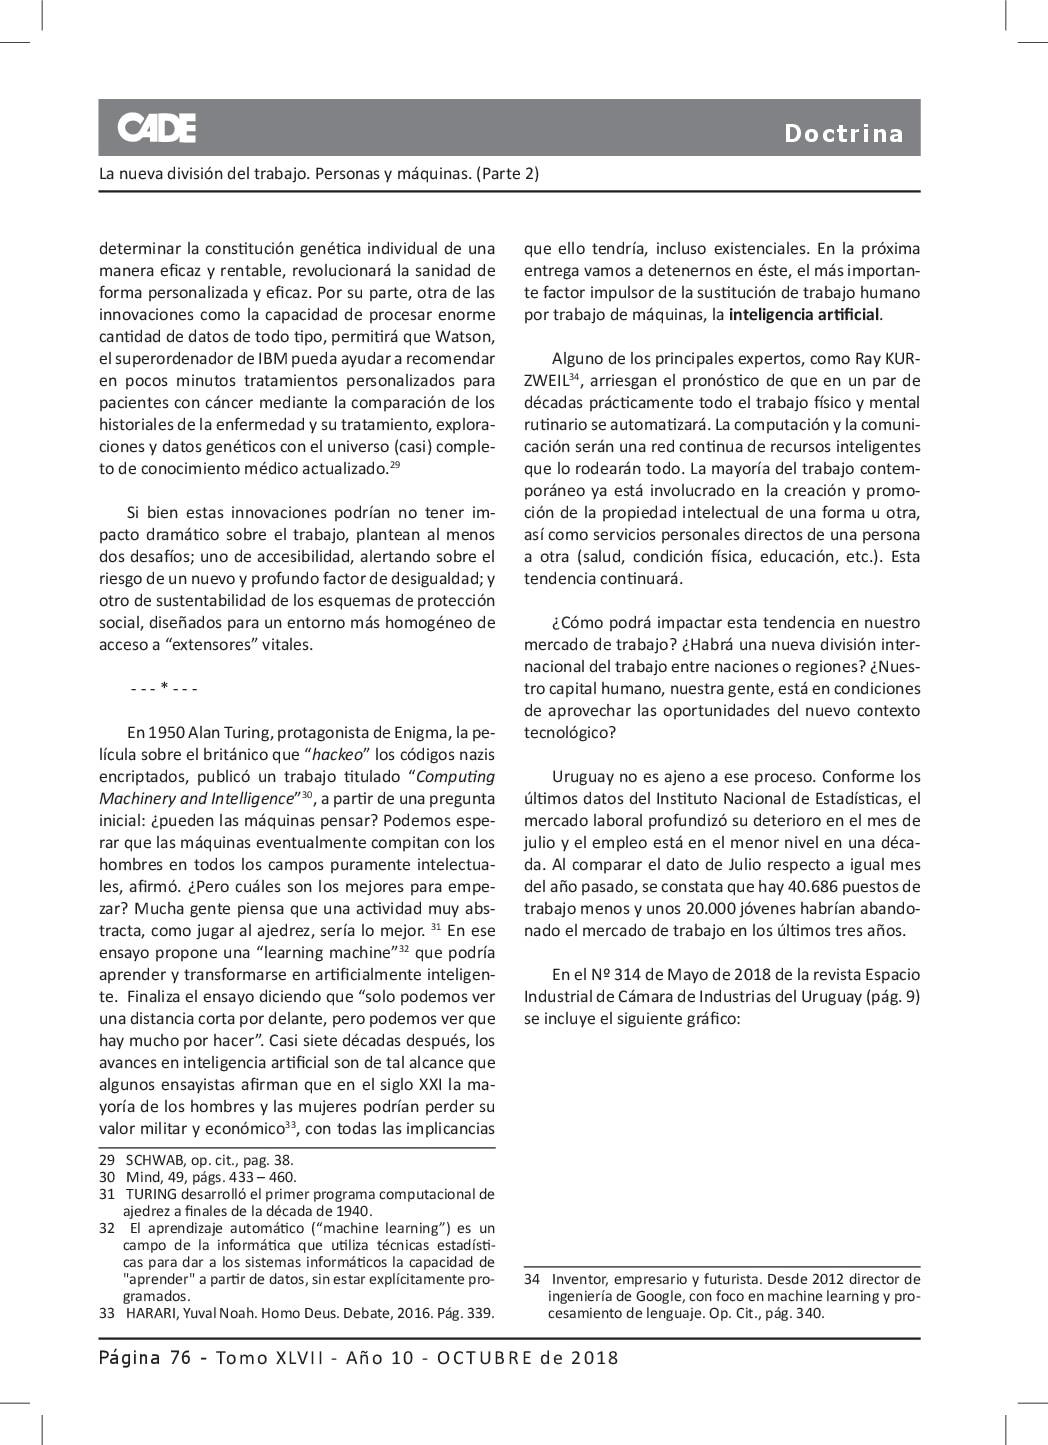 cade-doctrina-jurisprudencia-saldain-008